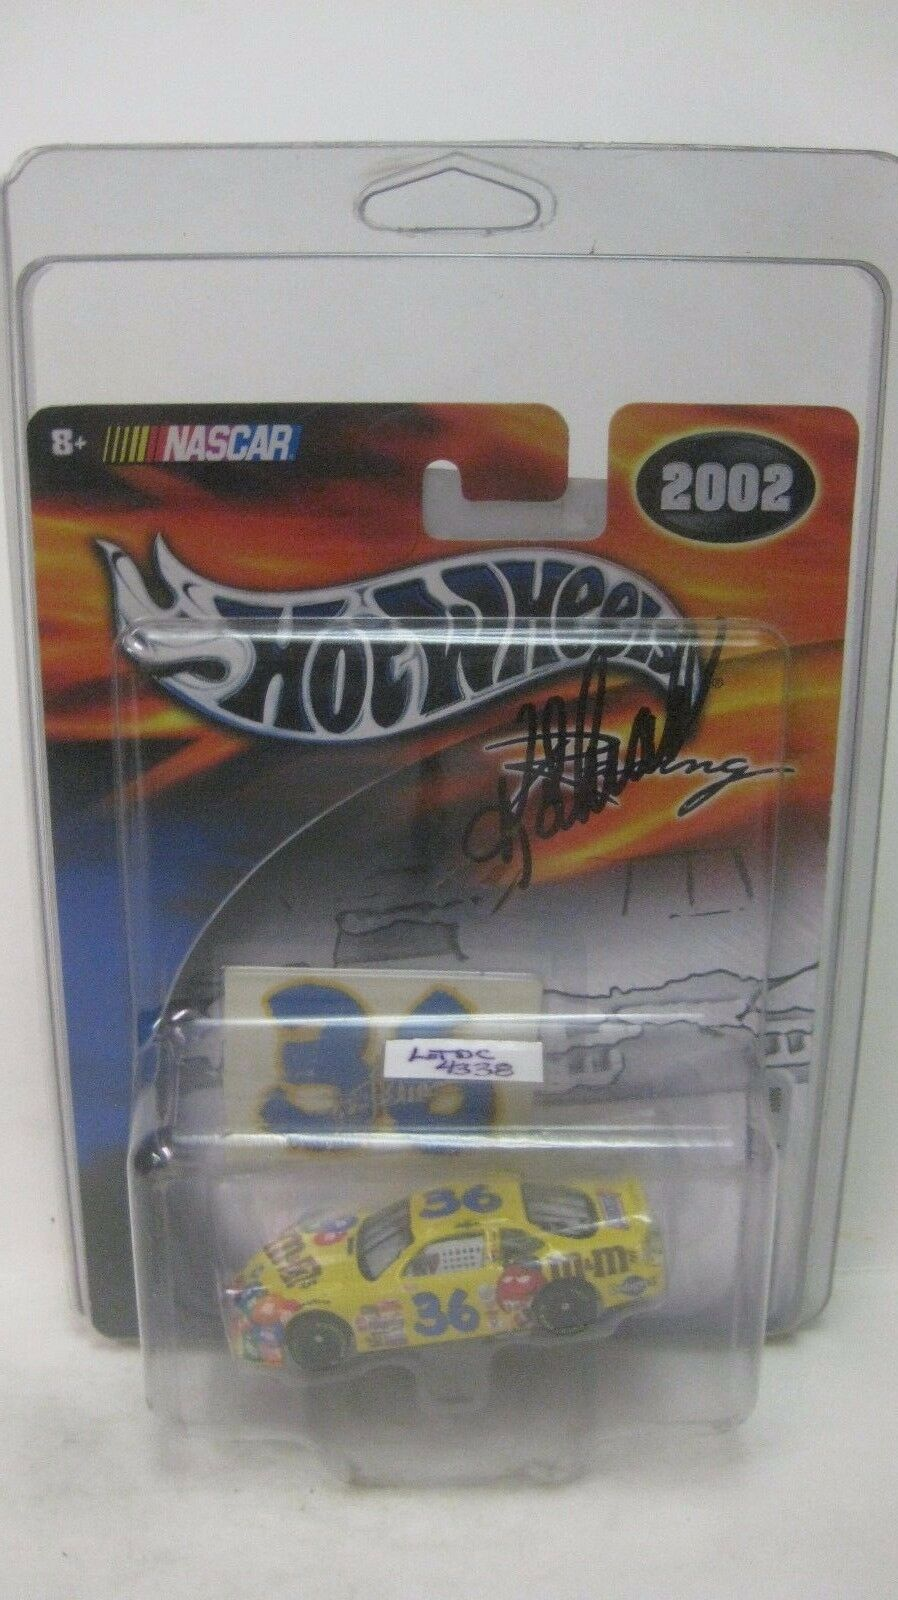 Raro Nascar 2002 Ken Schrader Firmado Gran Premio 1 64 de Metal Nuevo dc1426